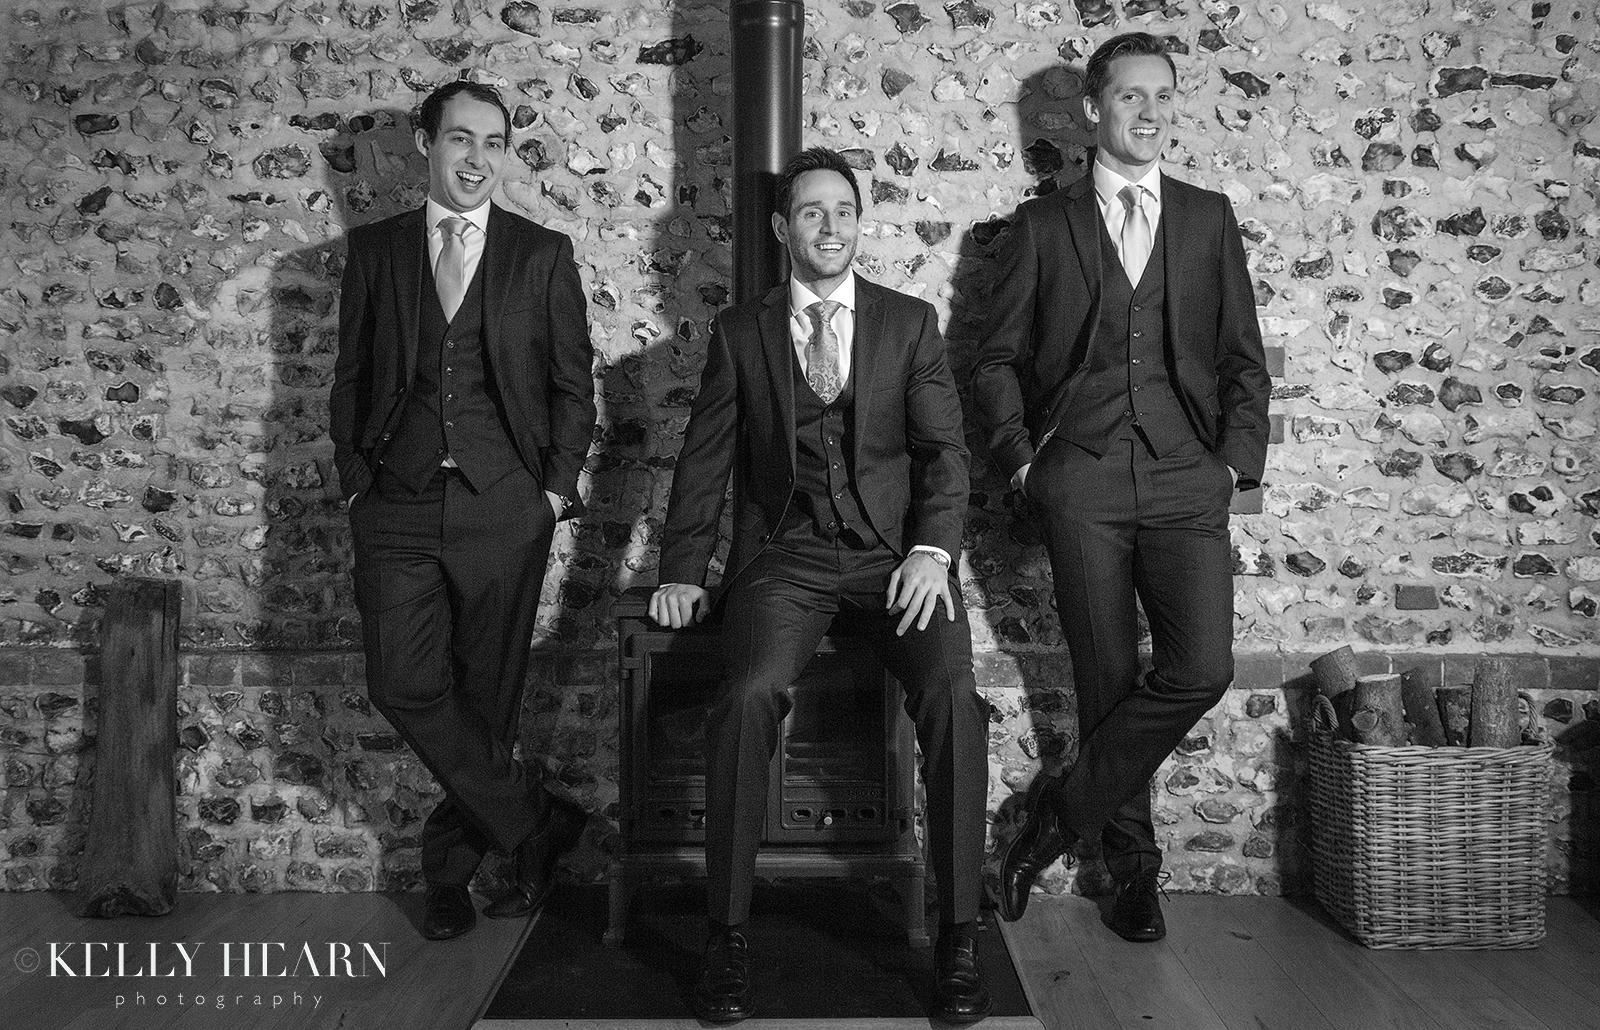 SPR_groom-groomsmen.jpg#asset:1995